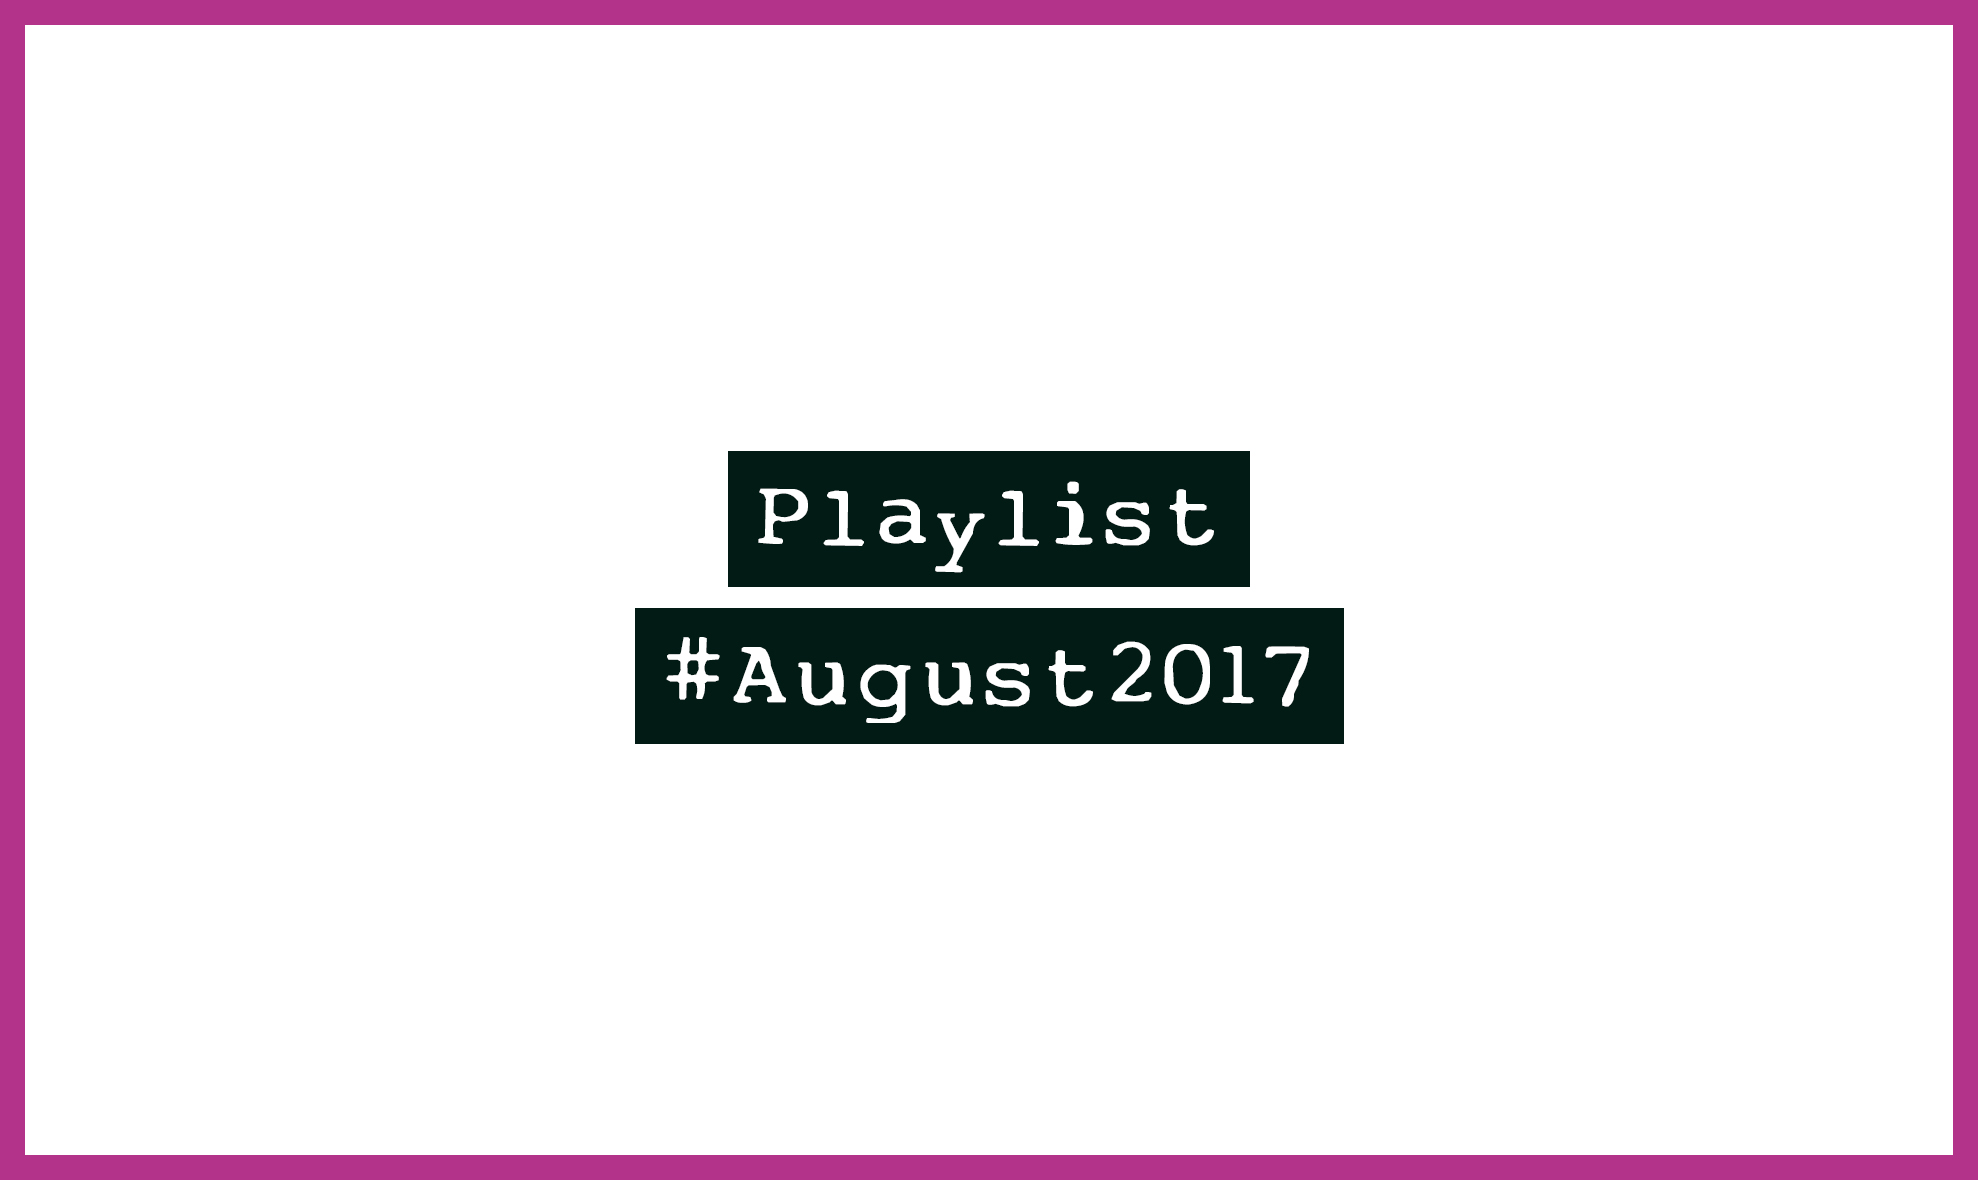 Playlist #August2017